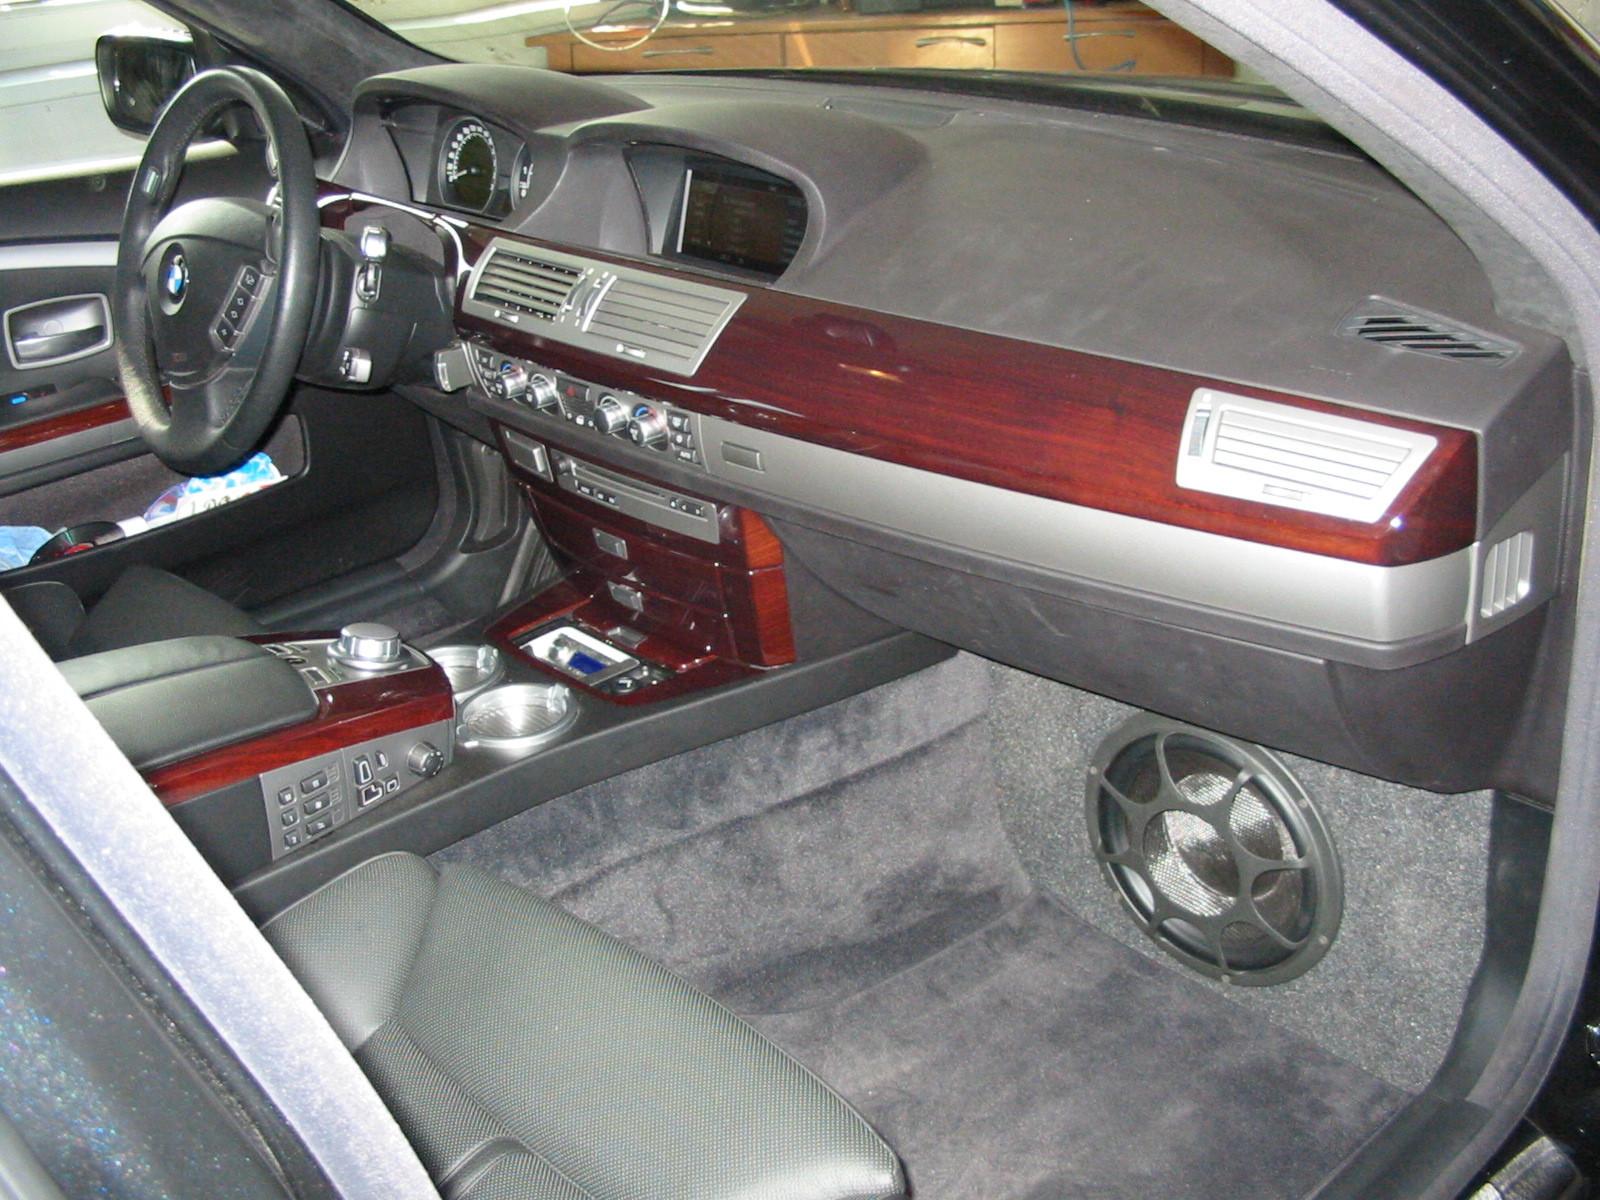 BMW 7er (e65) - Frontsubwoofer unter Handschuhfach